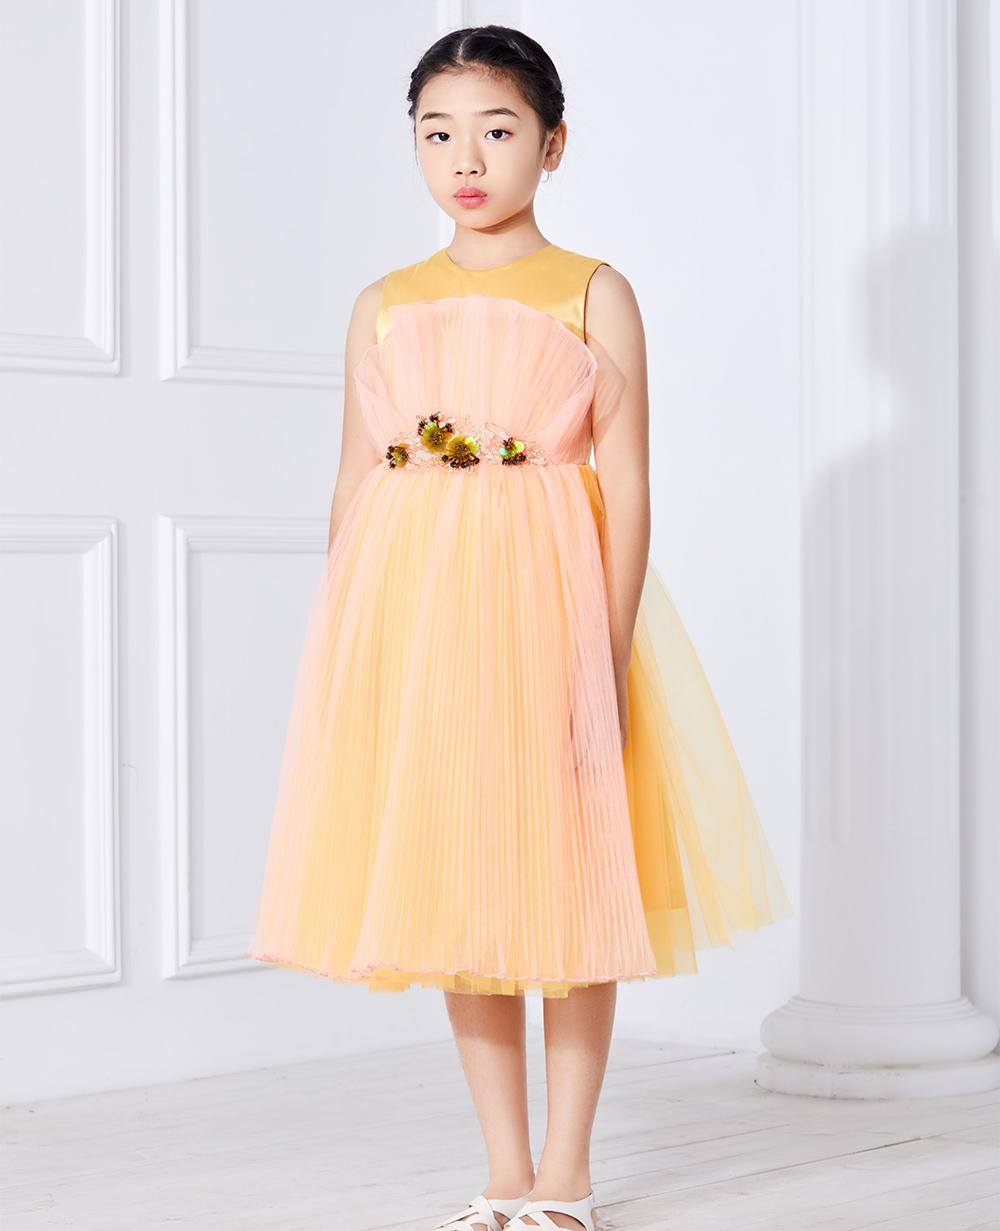 Orange Sleeveless Tulle Dress Embroidered Dress